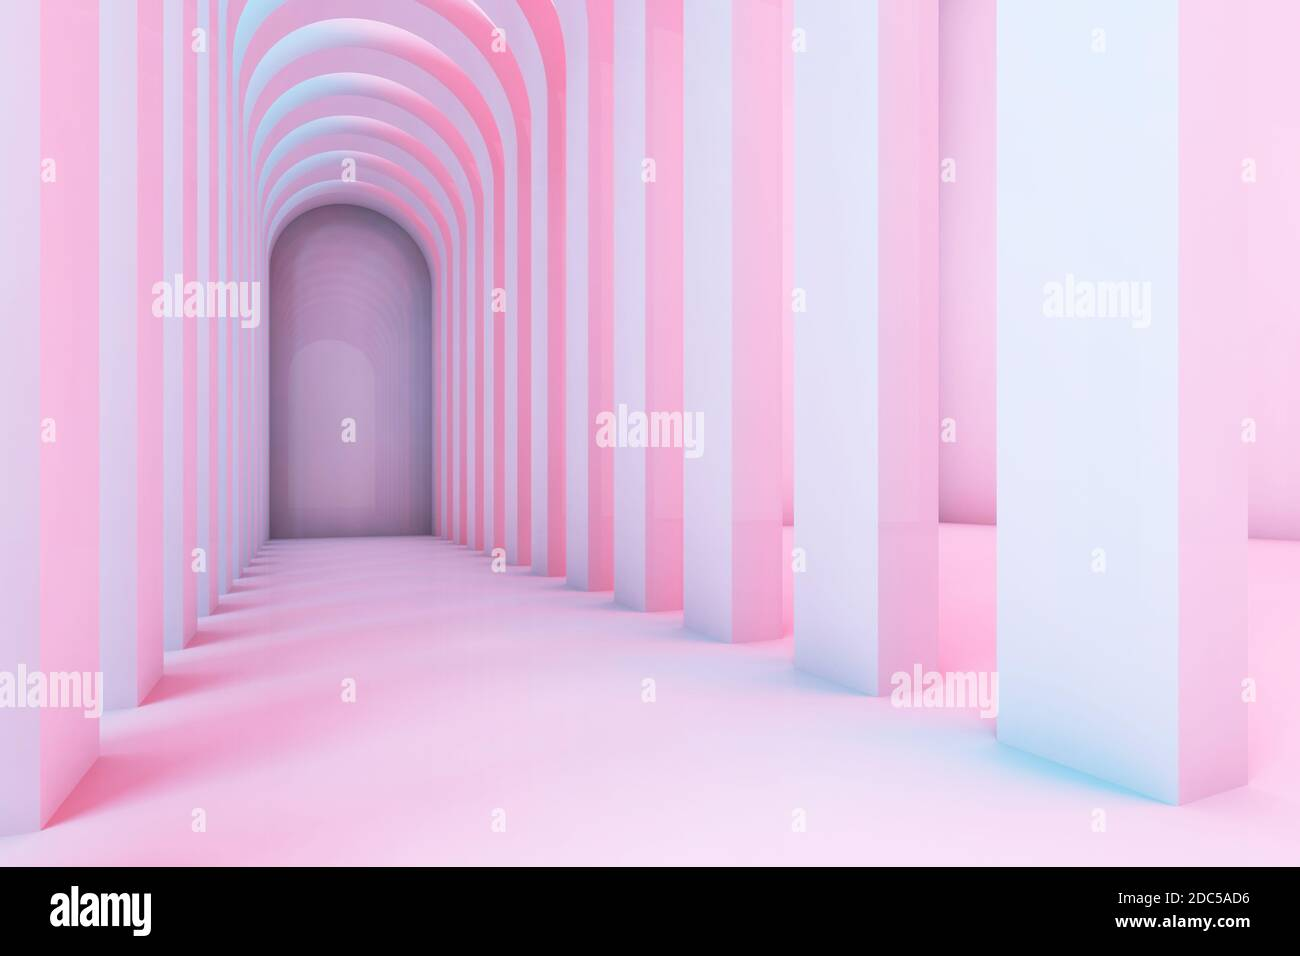 Pasillo vacío de arcos con iluminación colorida, fondo interior abstracto. ilustración de renderización 3d Foto de stock